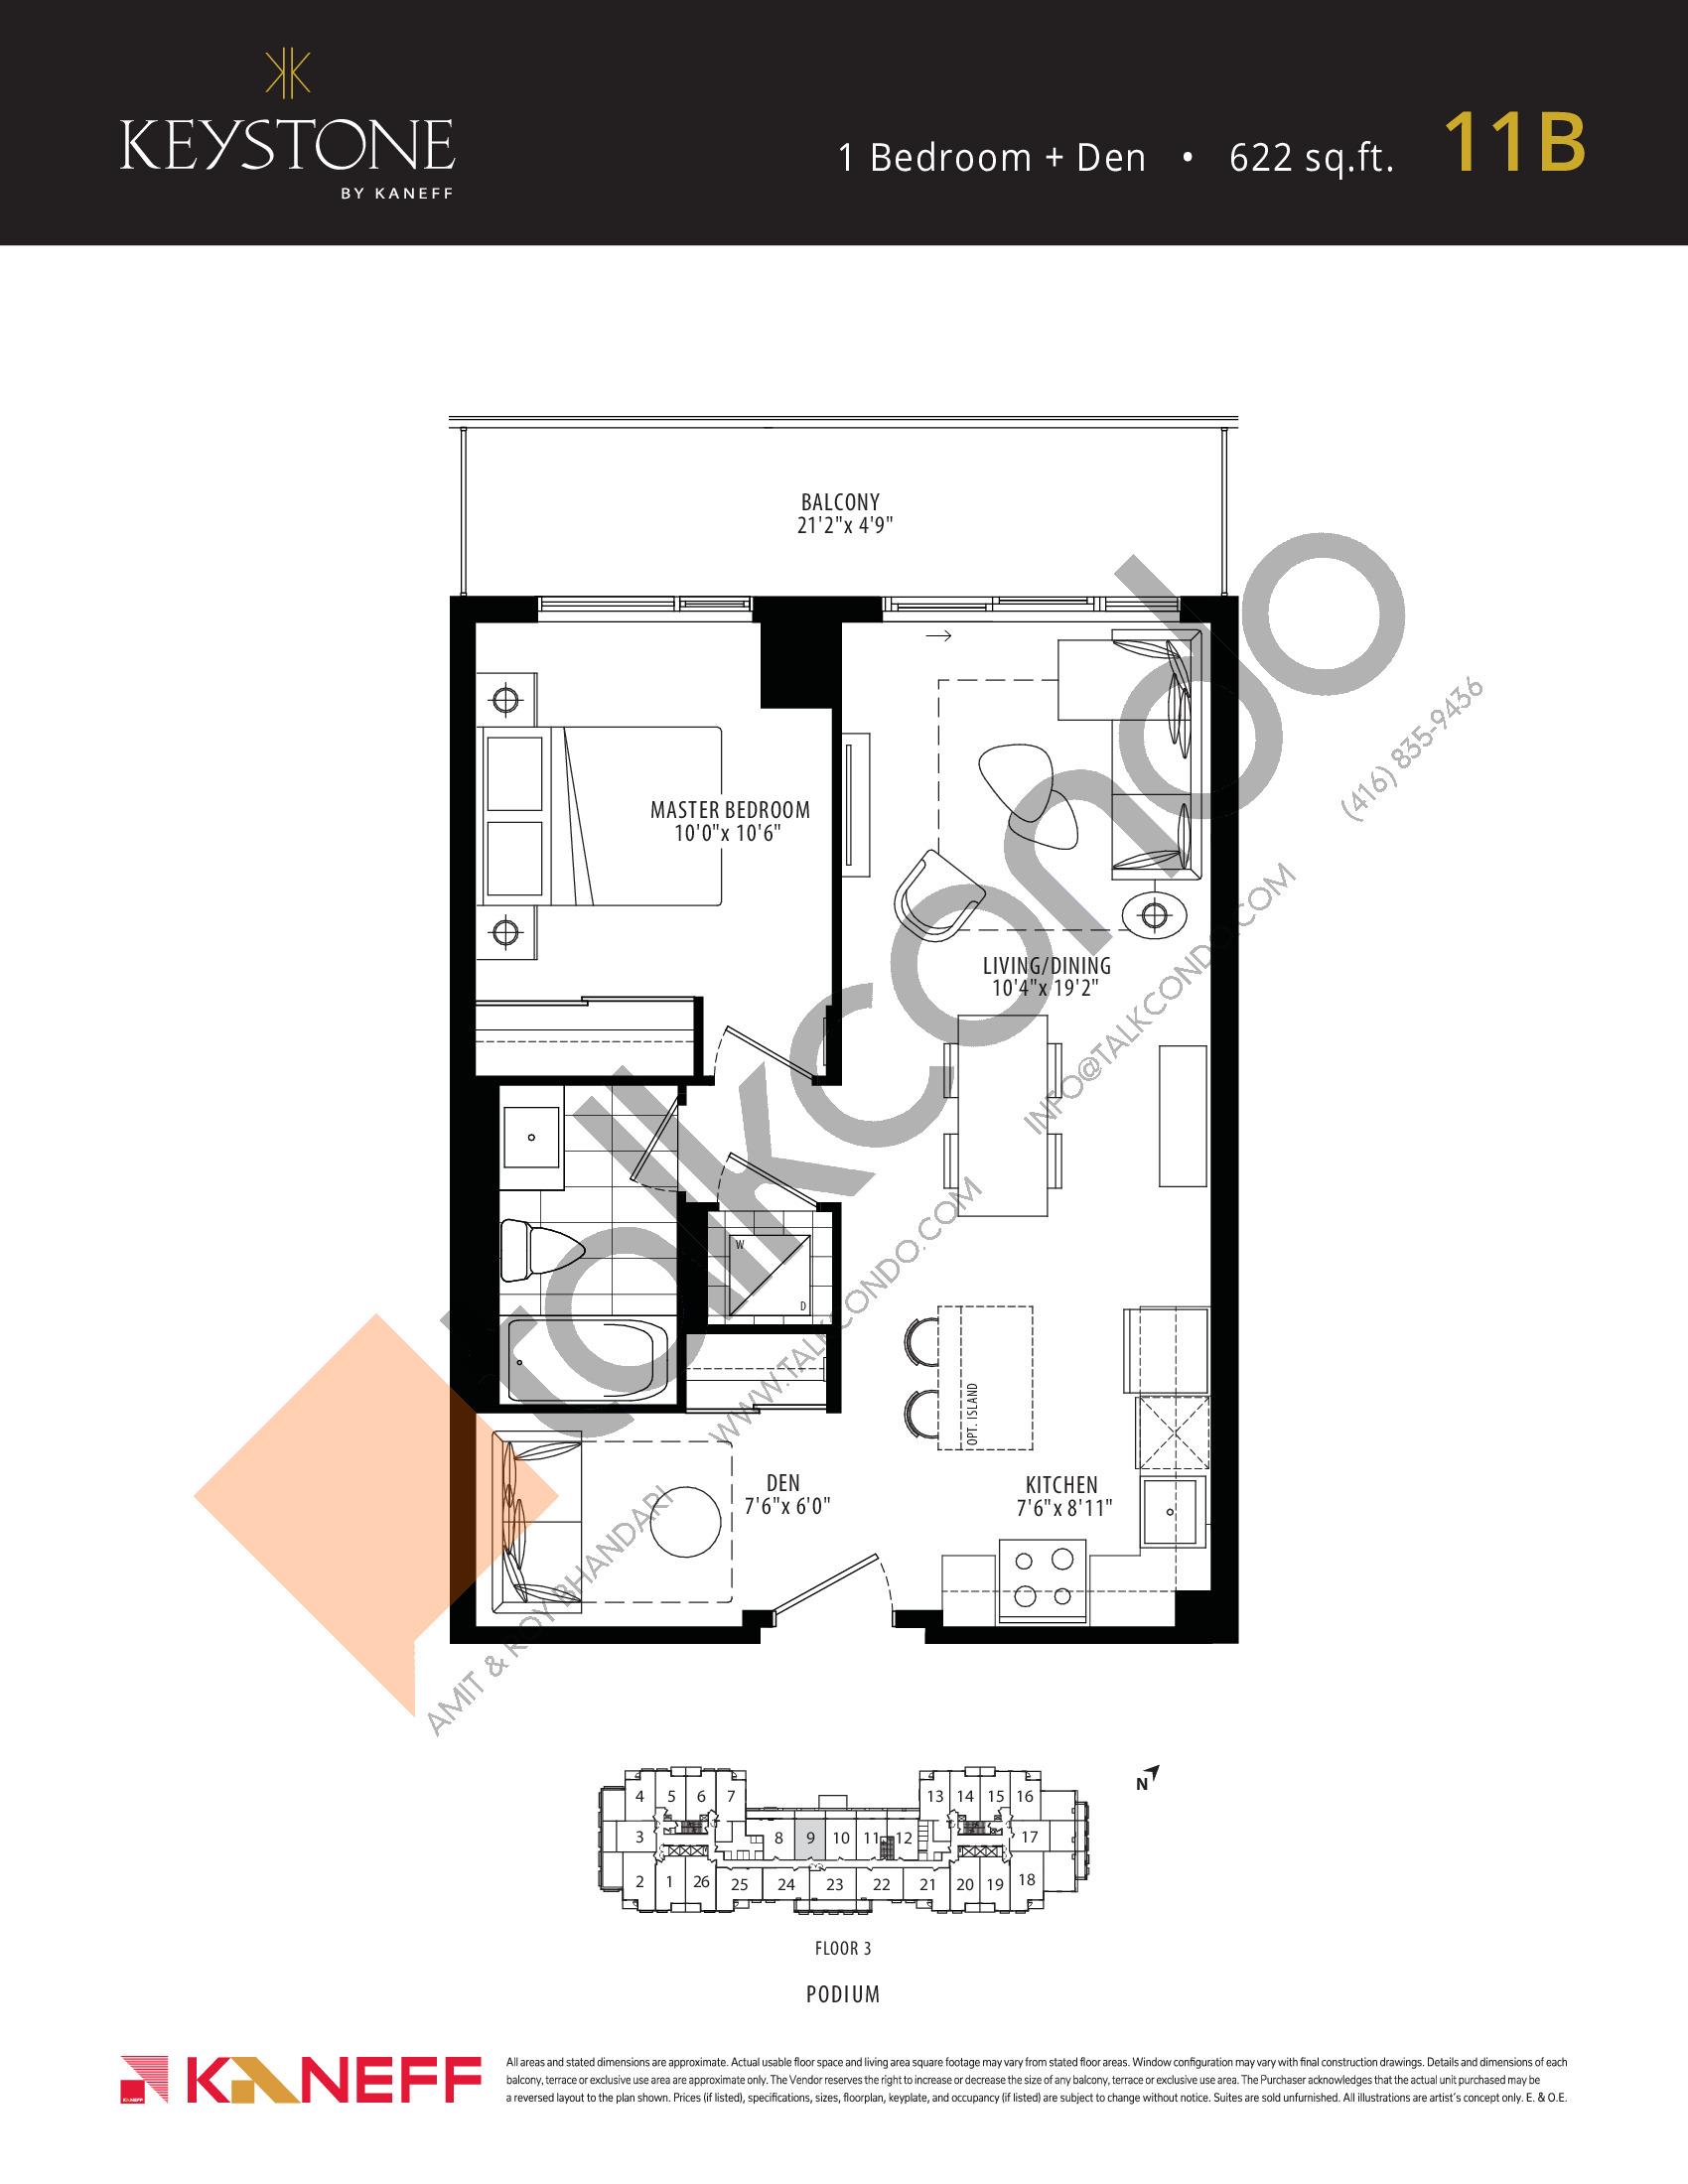 11B Floor Plan at Keystone Condos Phase 2 - 622 sq.ft